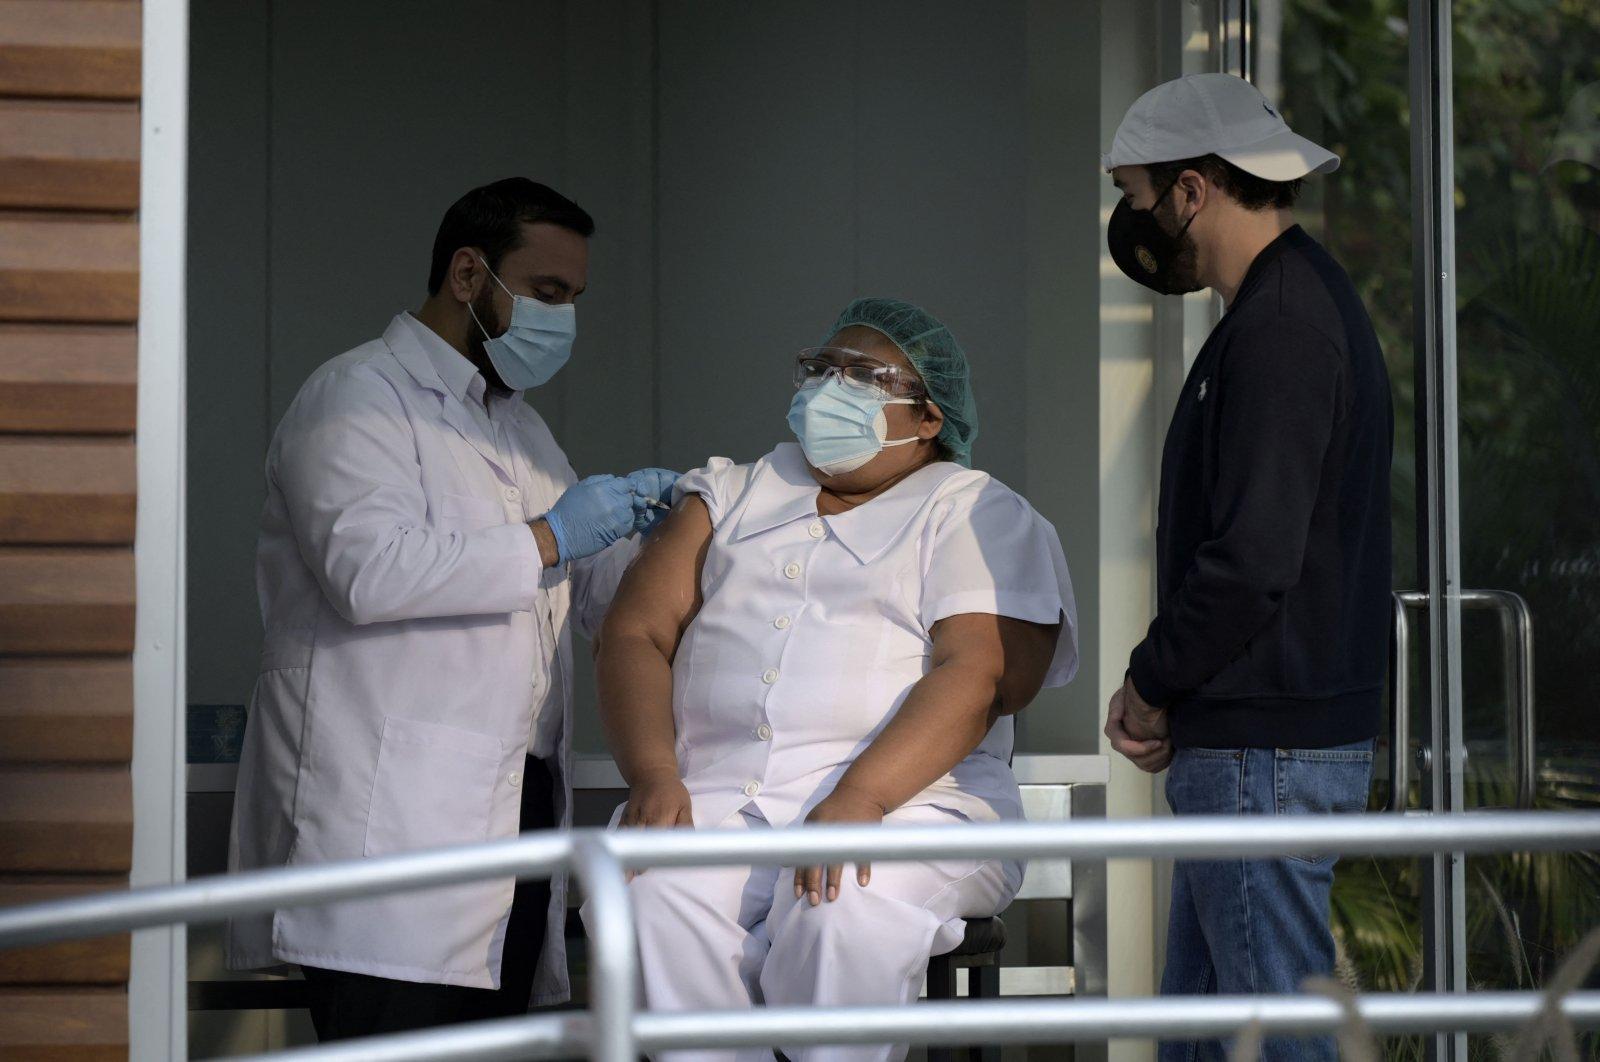 Salvadoran President Nayib Bukele (R) observes as Health Minister Francisco Alabi applies the first Oxford/AstraZeneca vaccine against COVID-19 to a health worker amid the novel coronavirus pandemic, in San Salvador, El Salvador, Feb. 17, 2021. (AFP Photo)